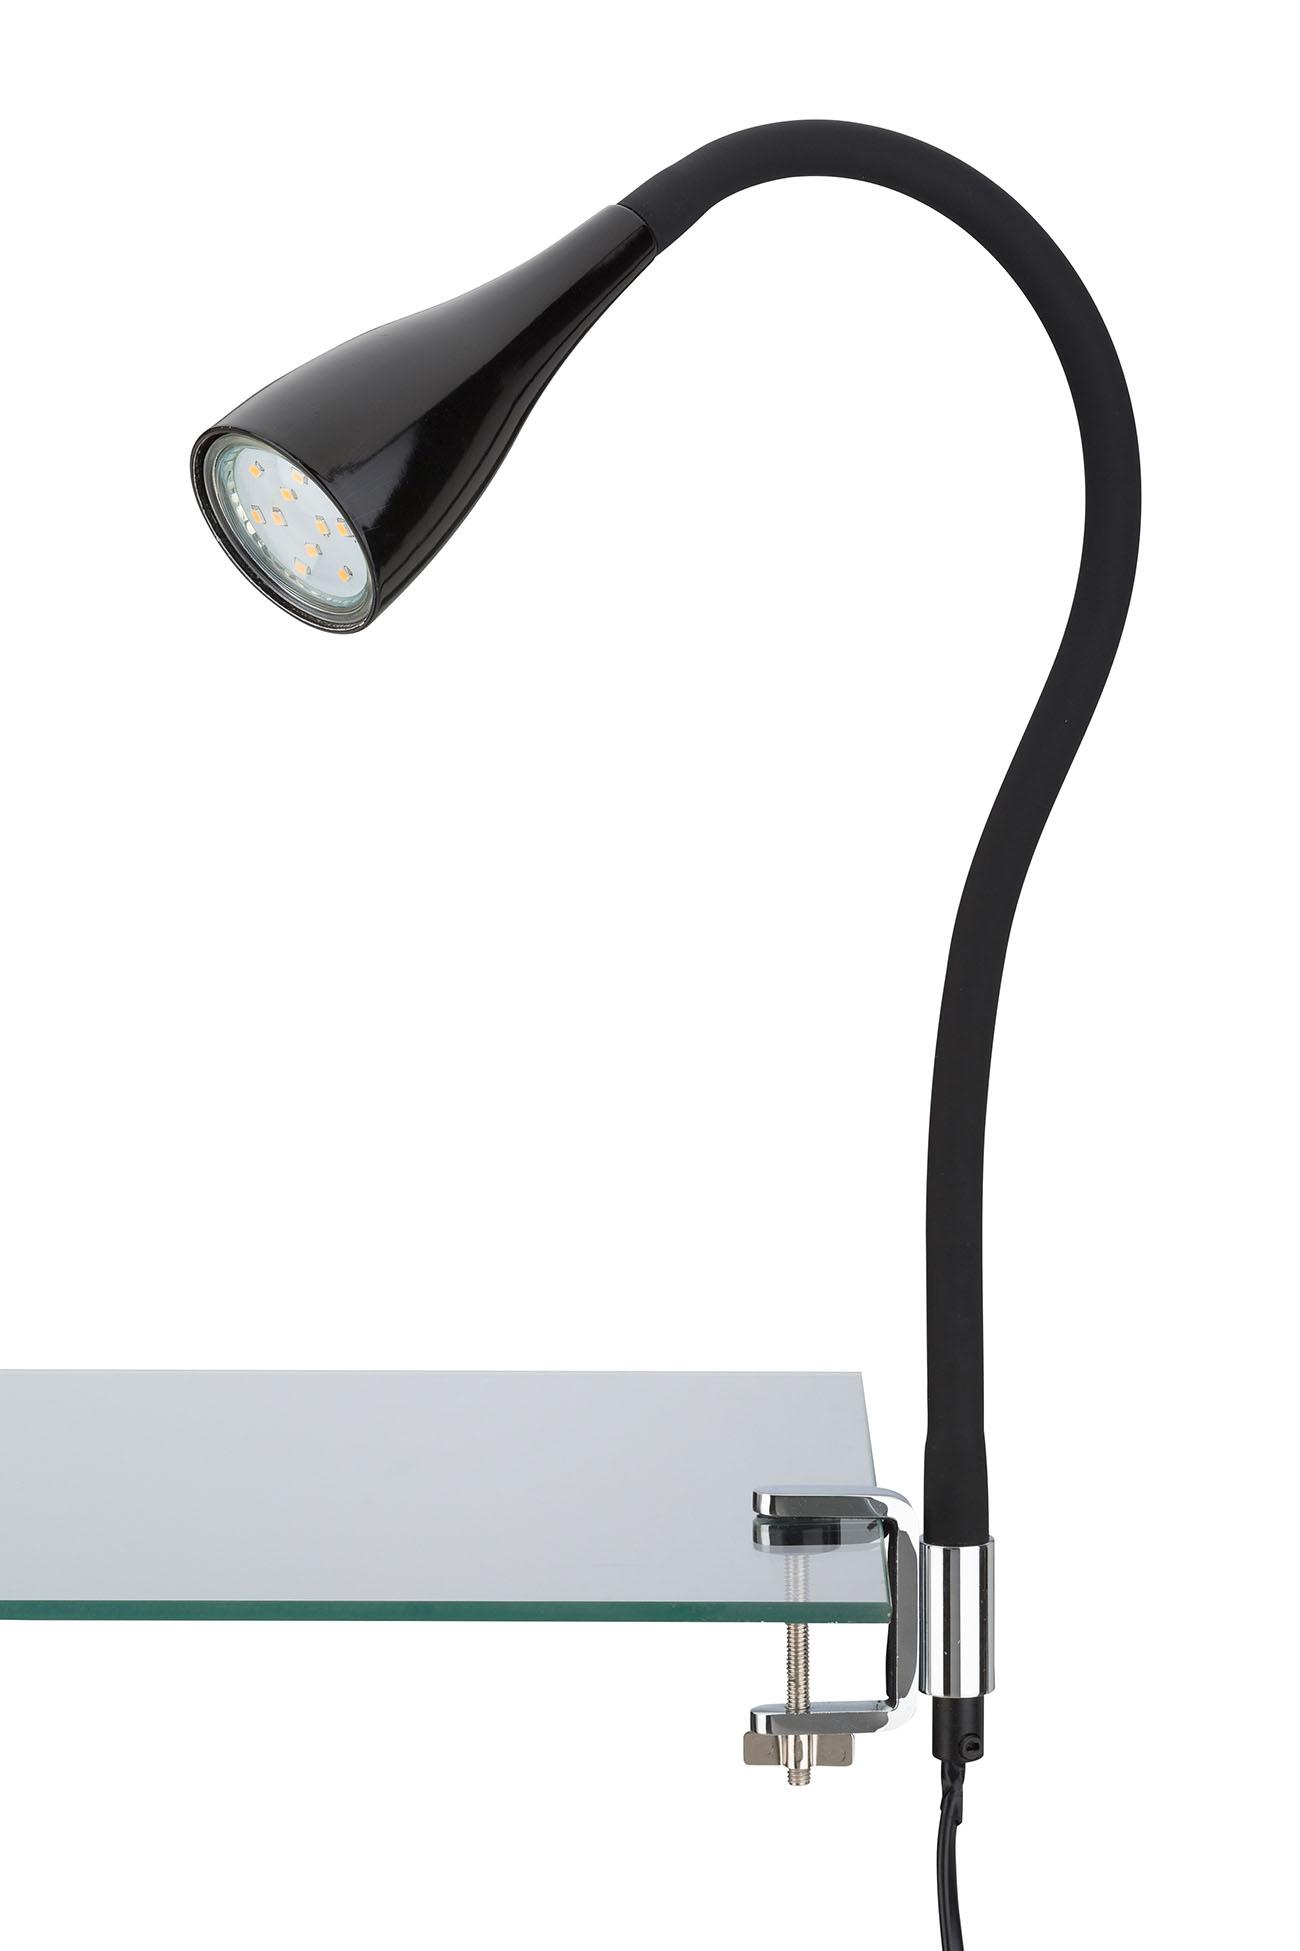 LED Klemmleuchte, 5,5 cm, 3 W, Schwarz